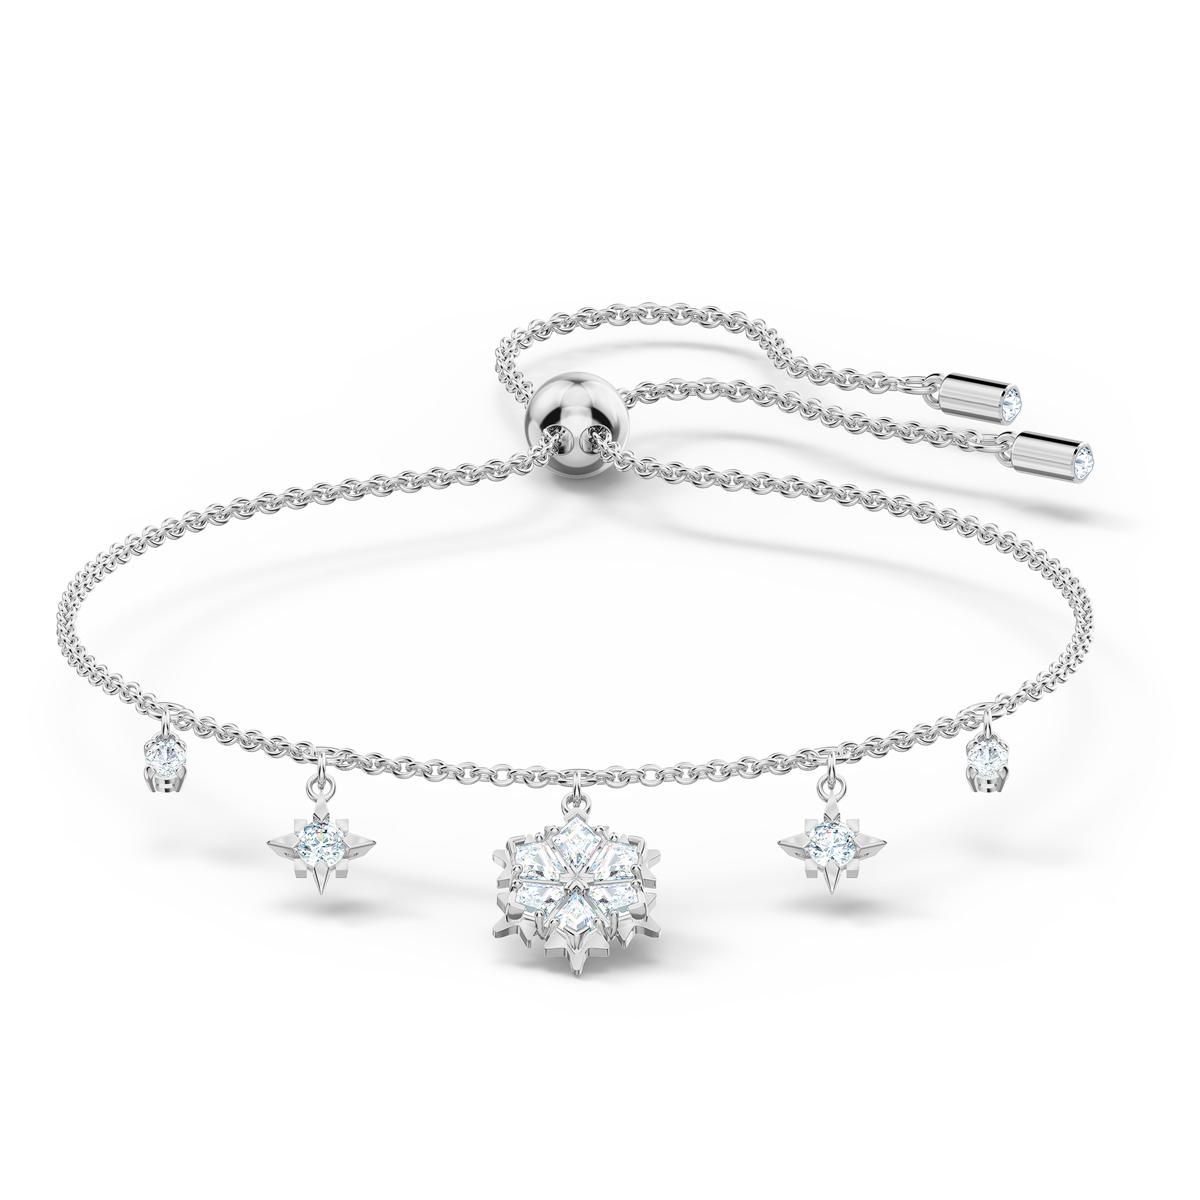 Swarovski Magic Bracelet, White, Rhodium Plated